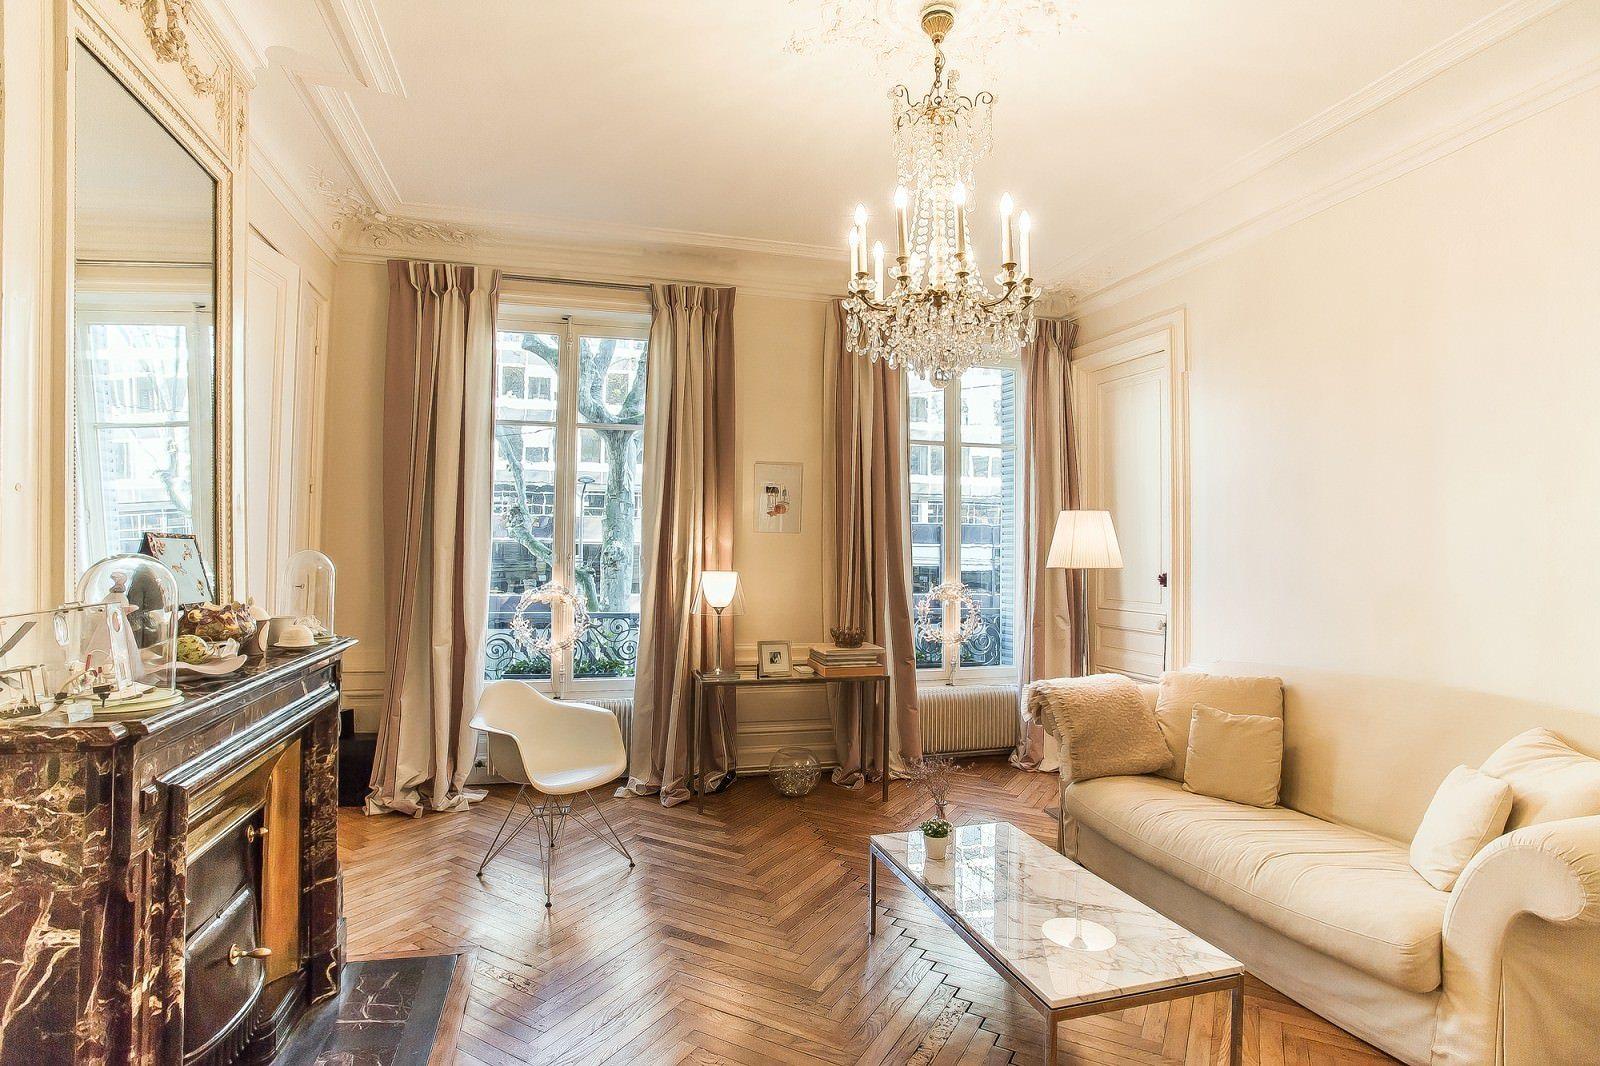 Однокомнатная квартира в стиле прованс с камином